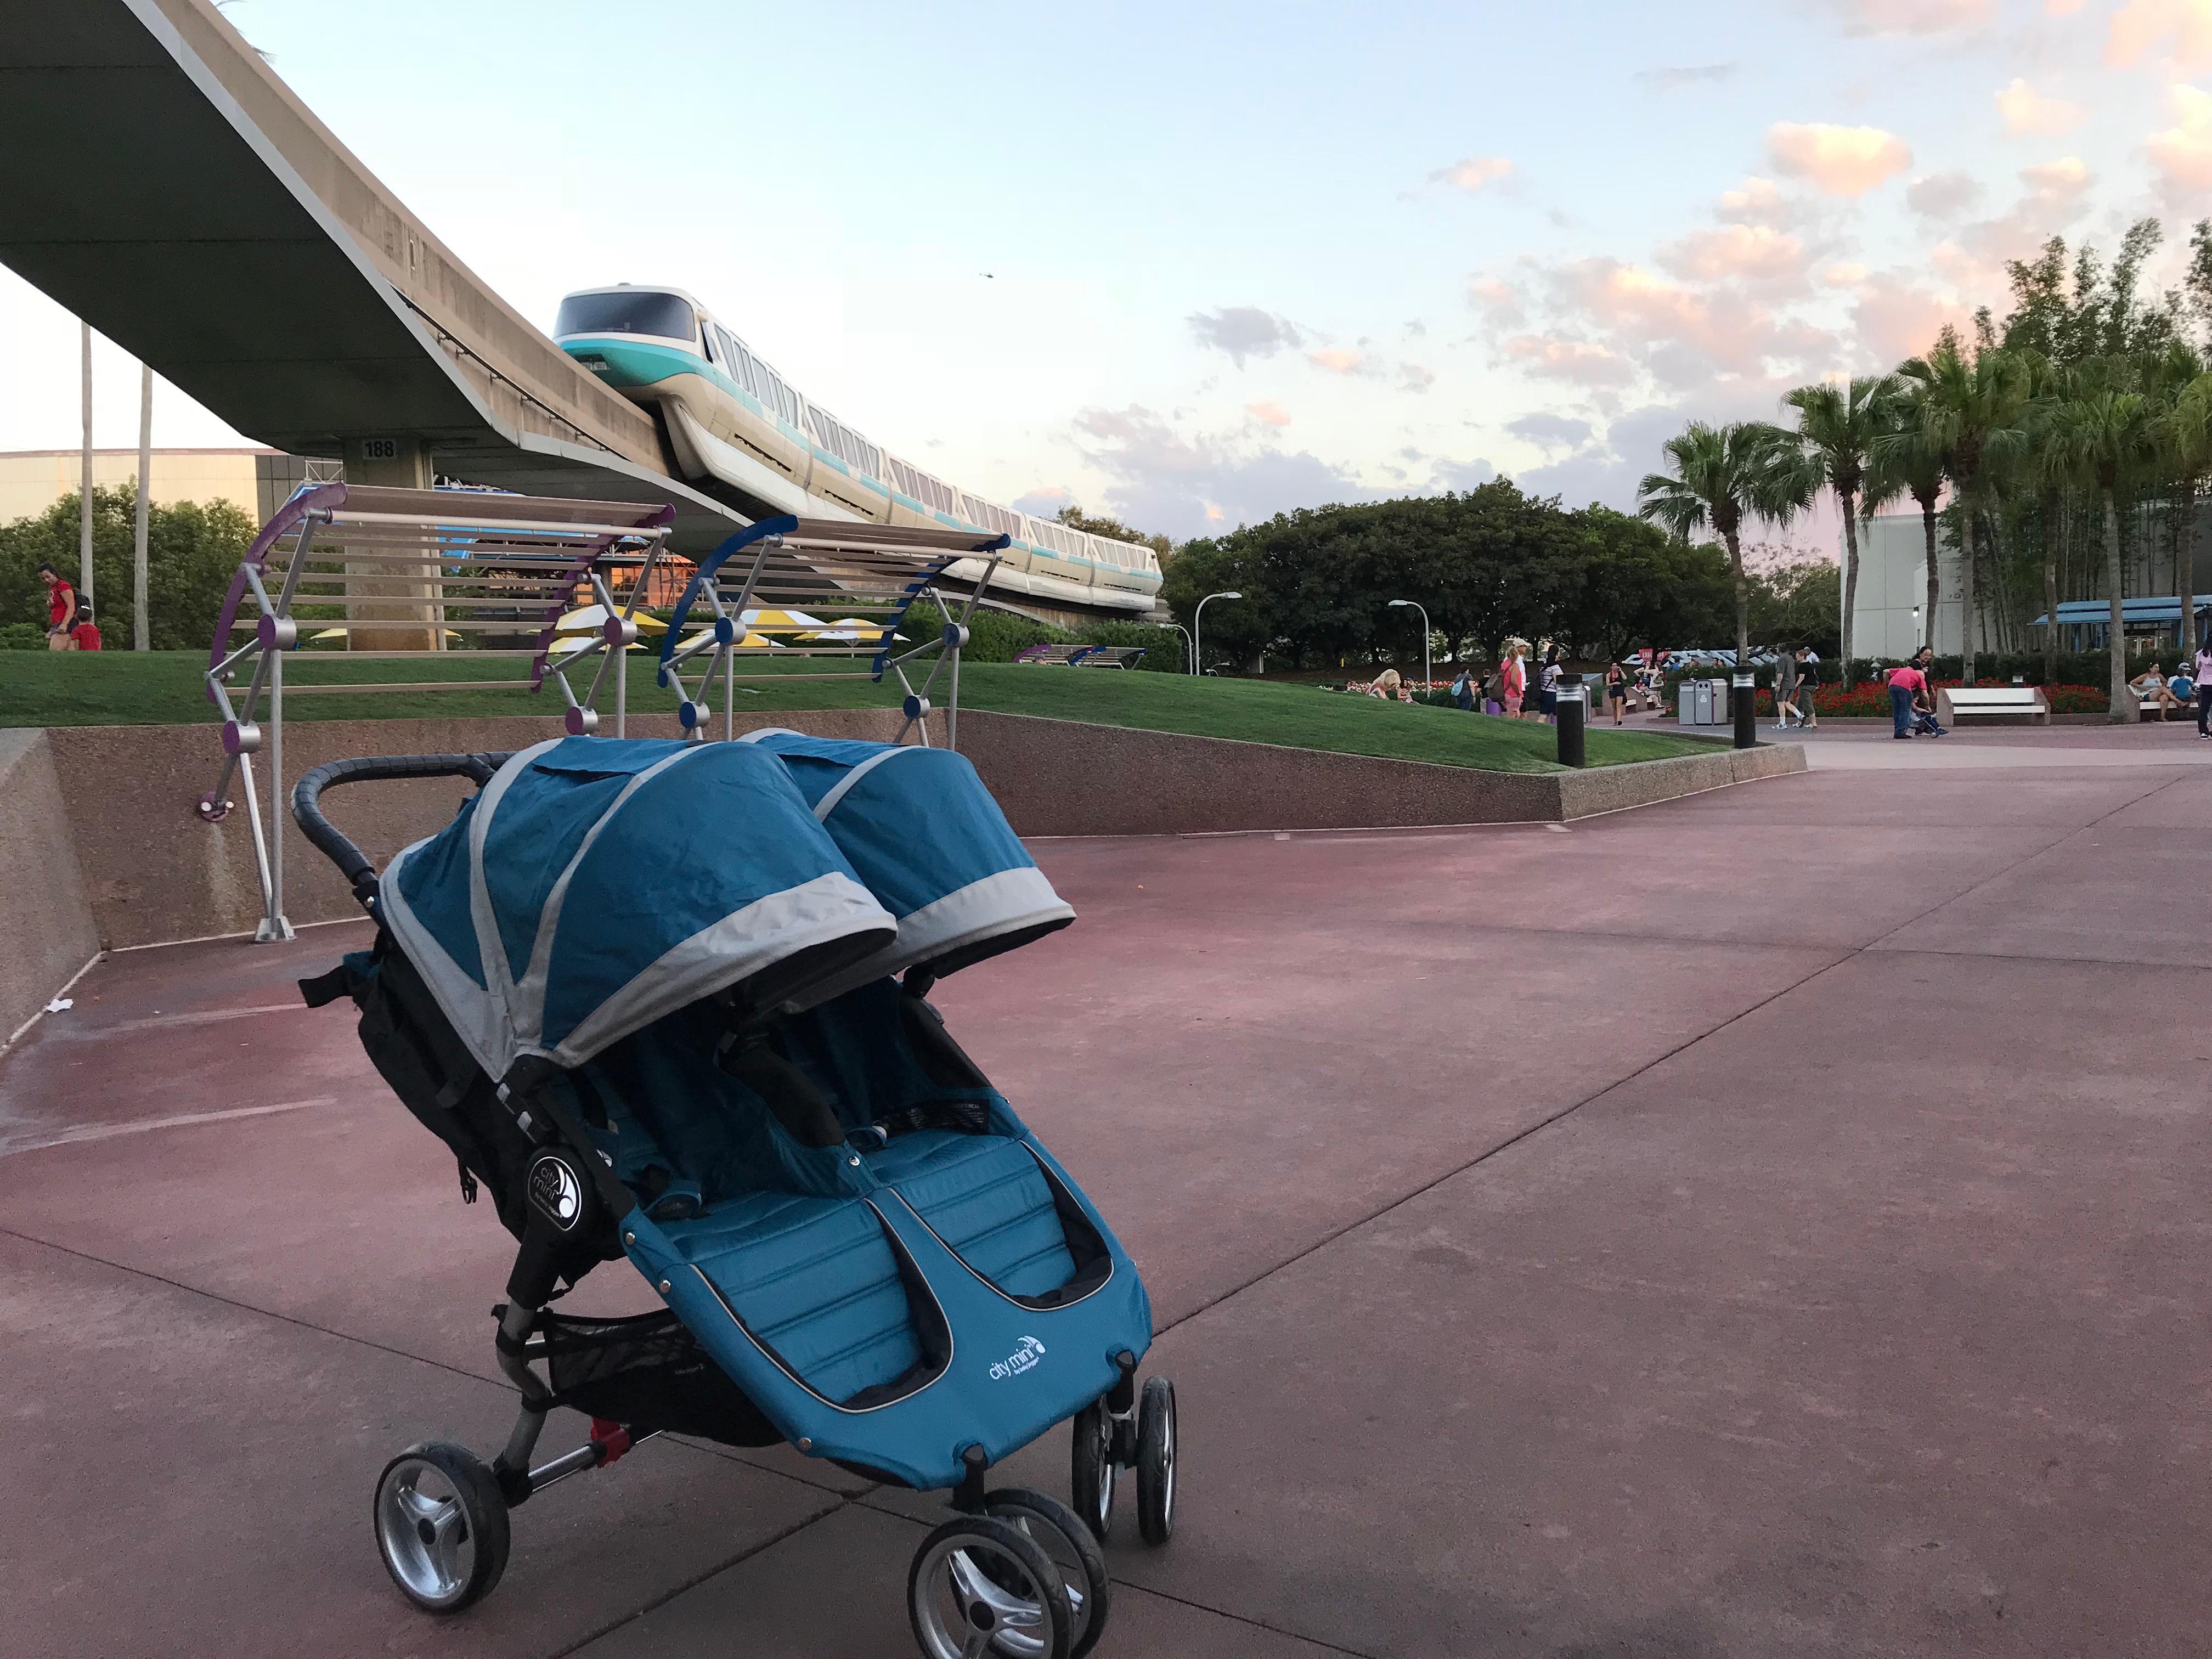 Stroller Rentals Disney image 51